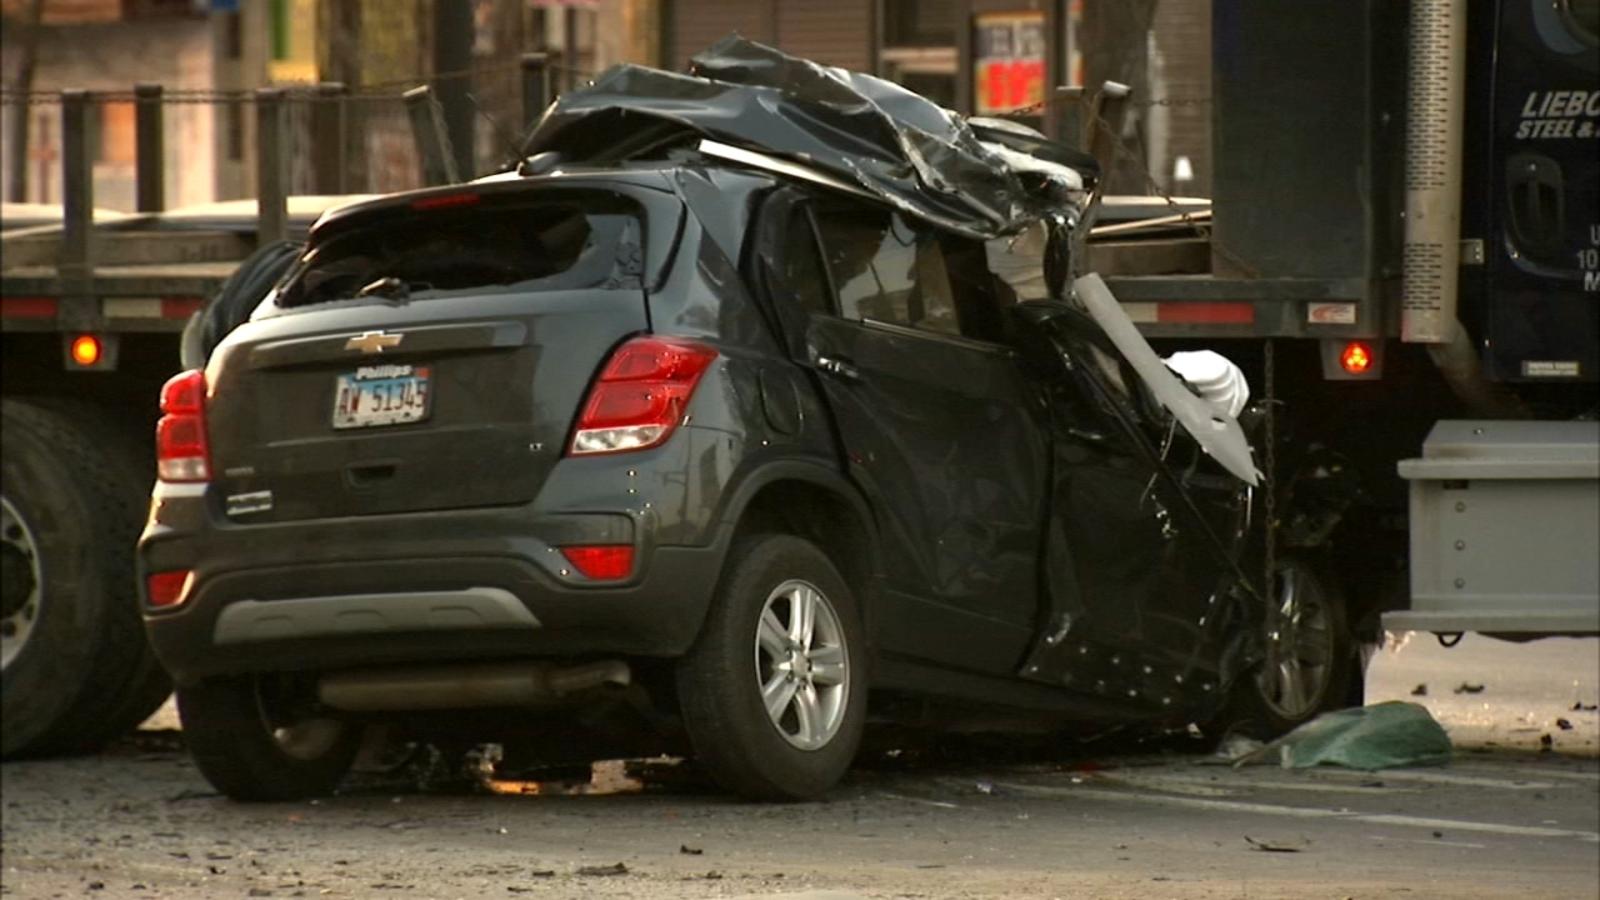 Rockford teen identified as 1 of 2 killed in Lawndale crash; woman injured by flying debris